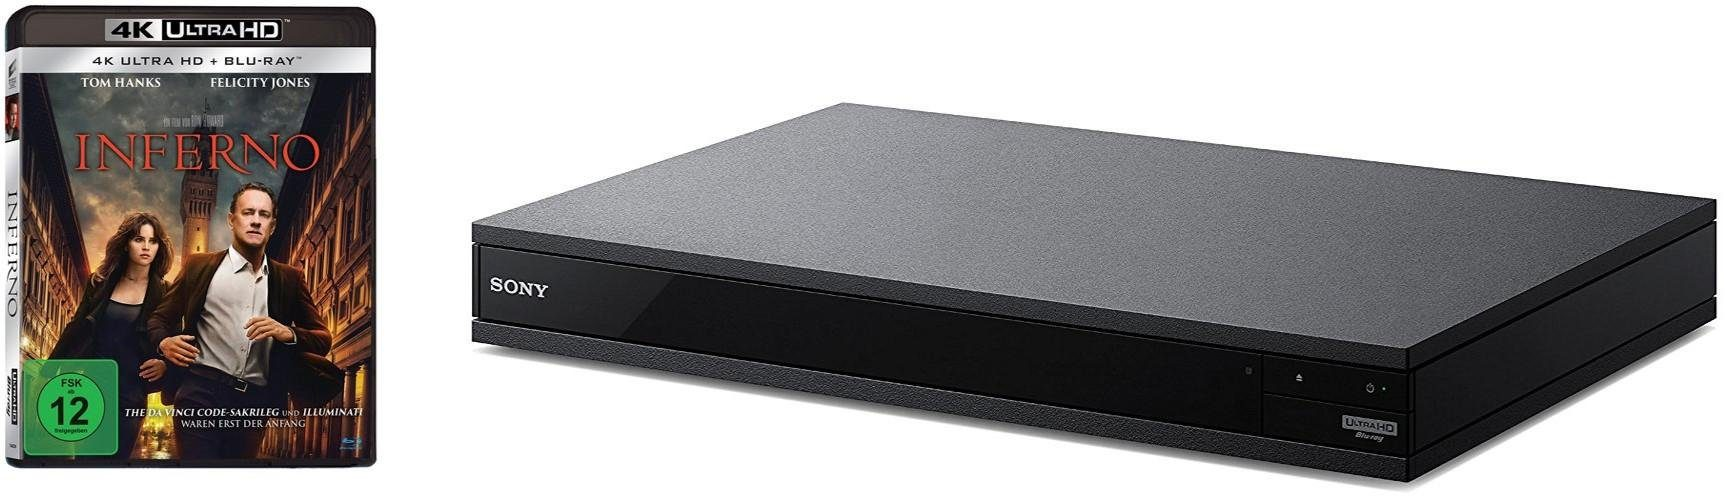 Sony UBP-X800B 4K Ultra HD Blu-ray Disc Player (UHD, High-Resolution Audio, Hi-Fi Qualität, Multi-Room, Bluetooth) incl. Inferno